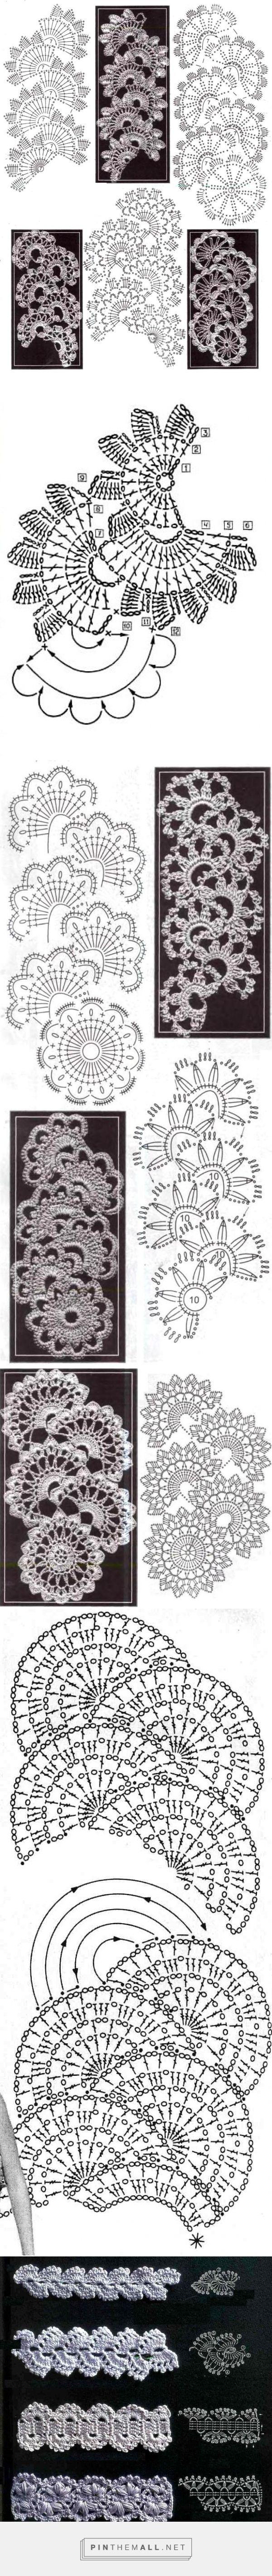 Floral crochet lace tape ~~ Ленточное кружево - вязание крючком на http://kru4ok.ru/lentochnoe-kruzhevo/